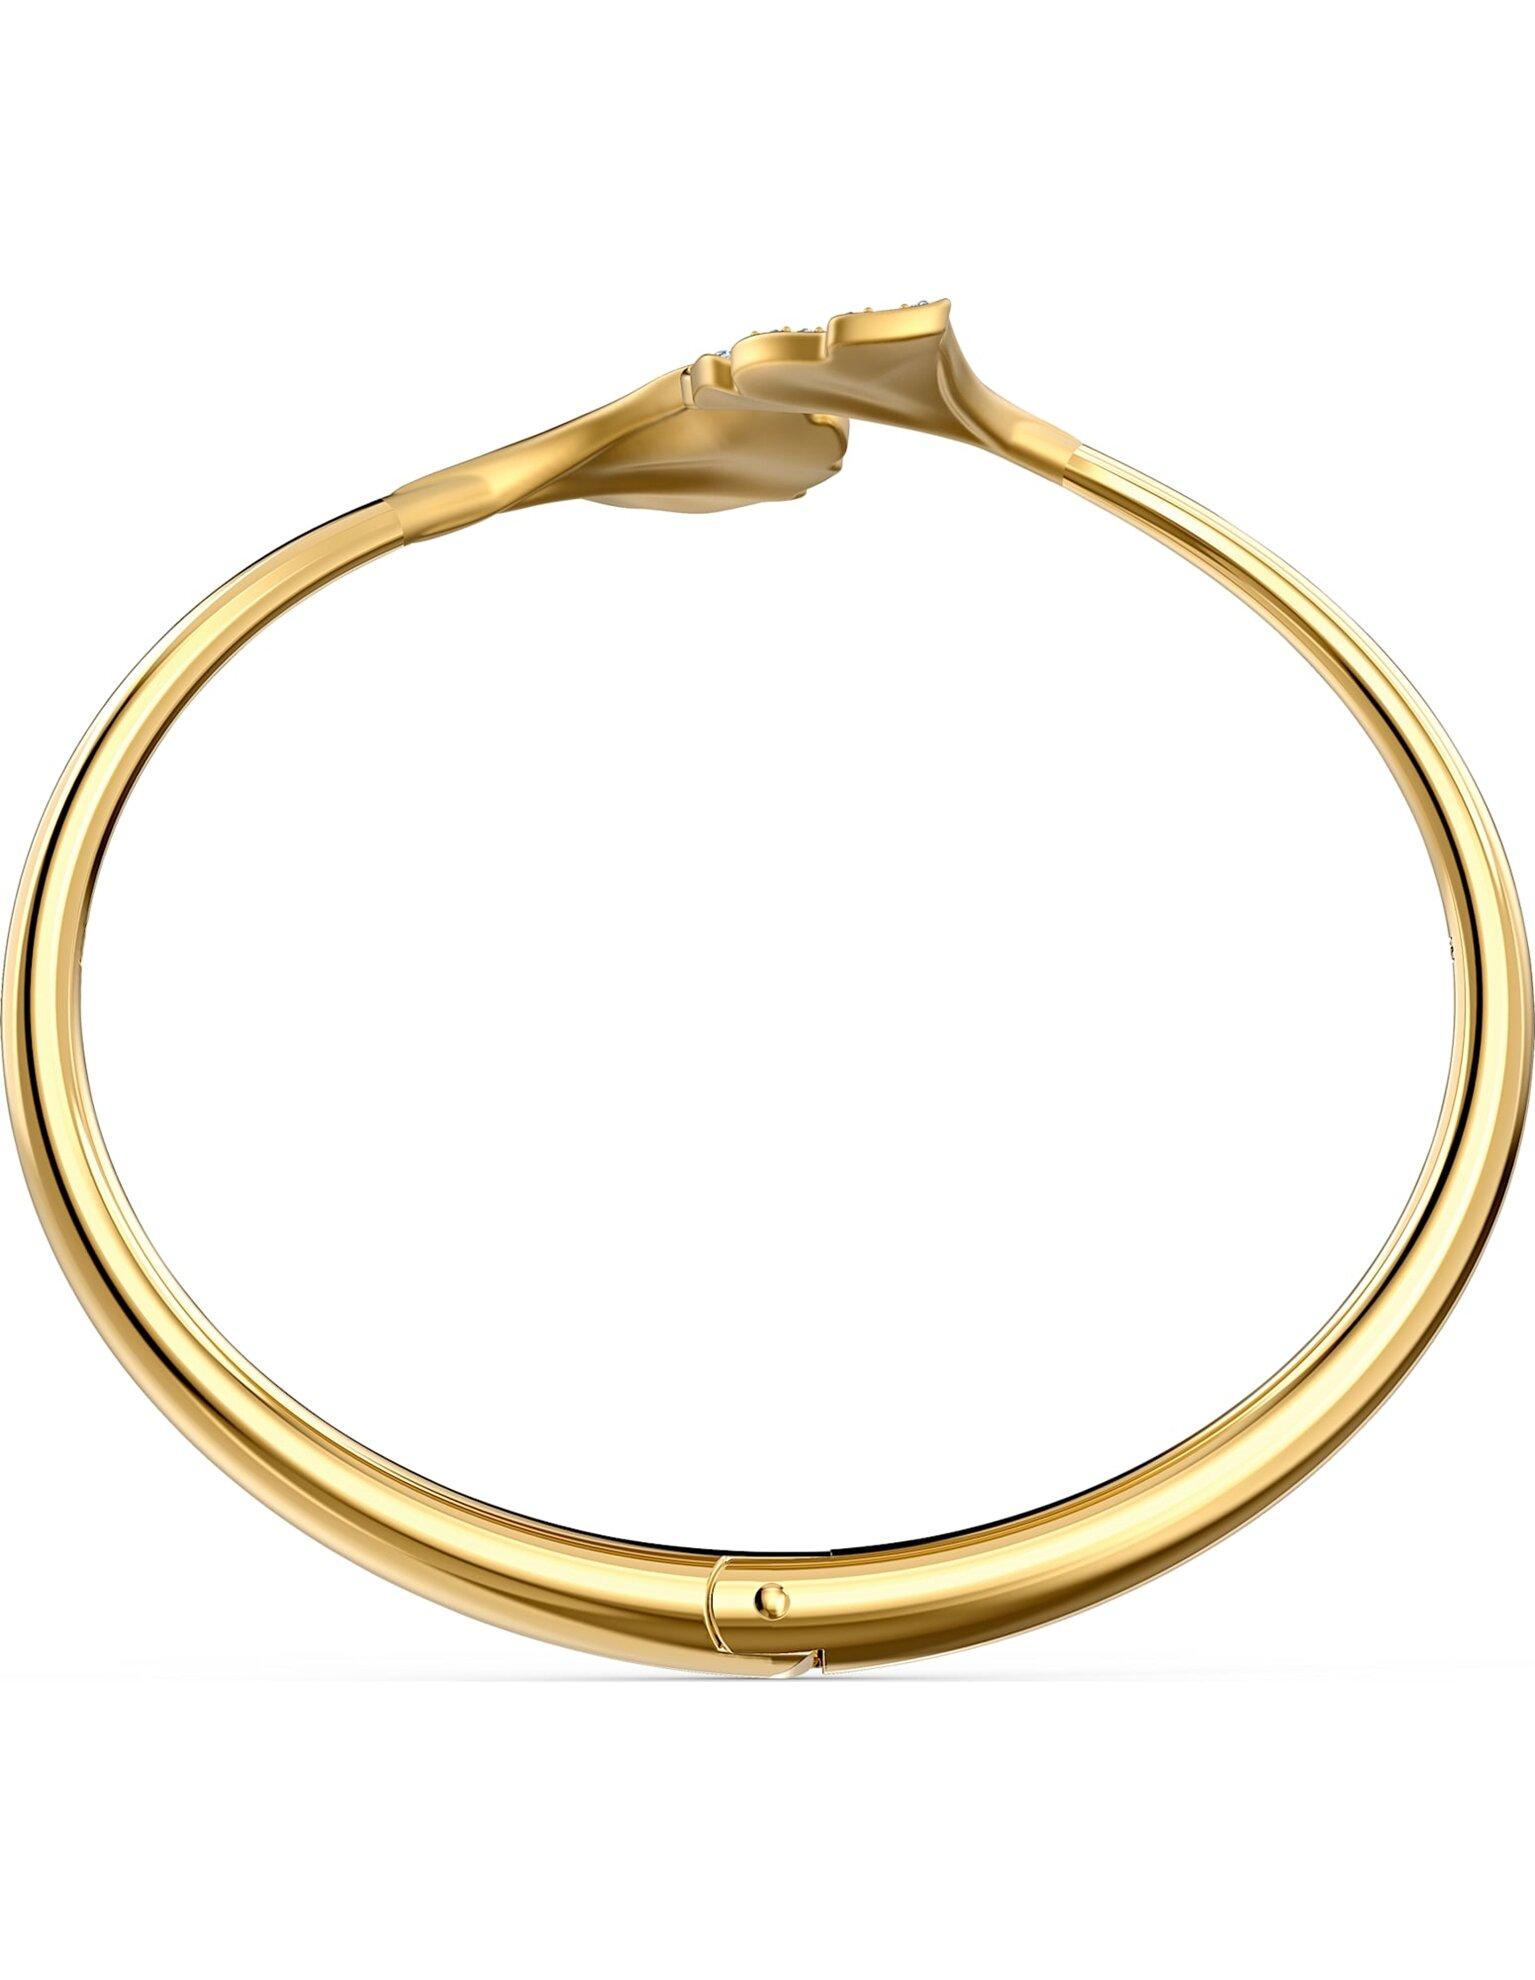 Picture of Stunning Ginko Bileklik, Beyaz, Altın rengi kaplama